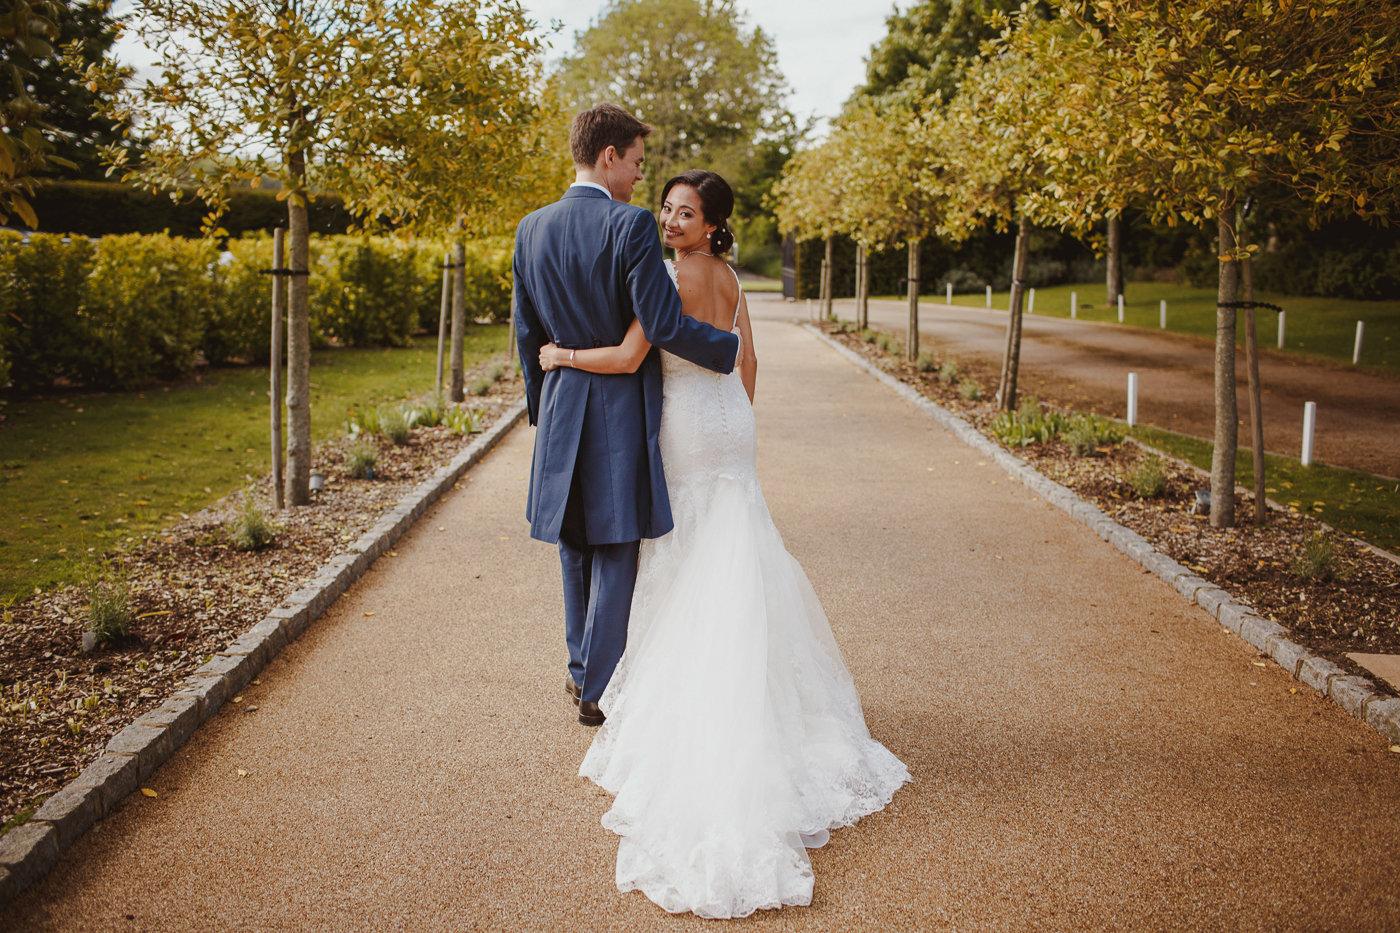 froyle-park-wedding-photography-27.jpg